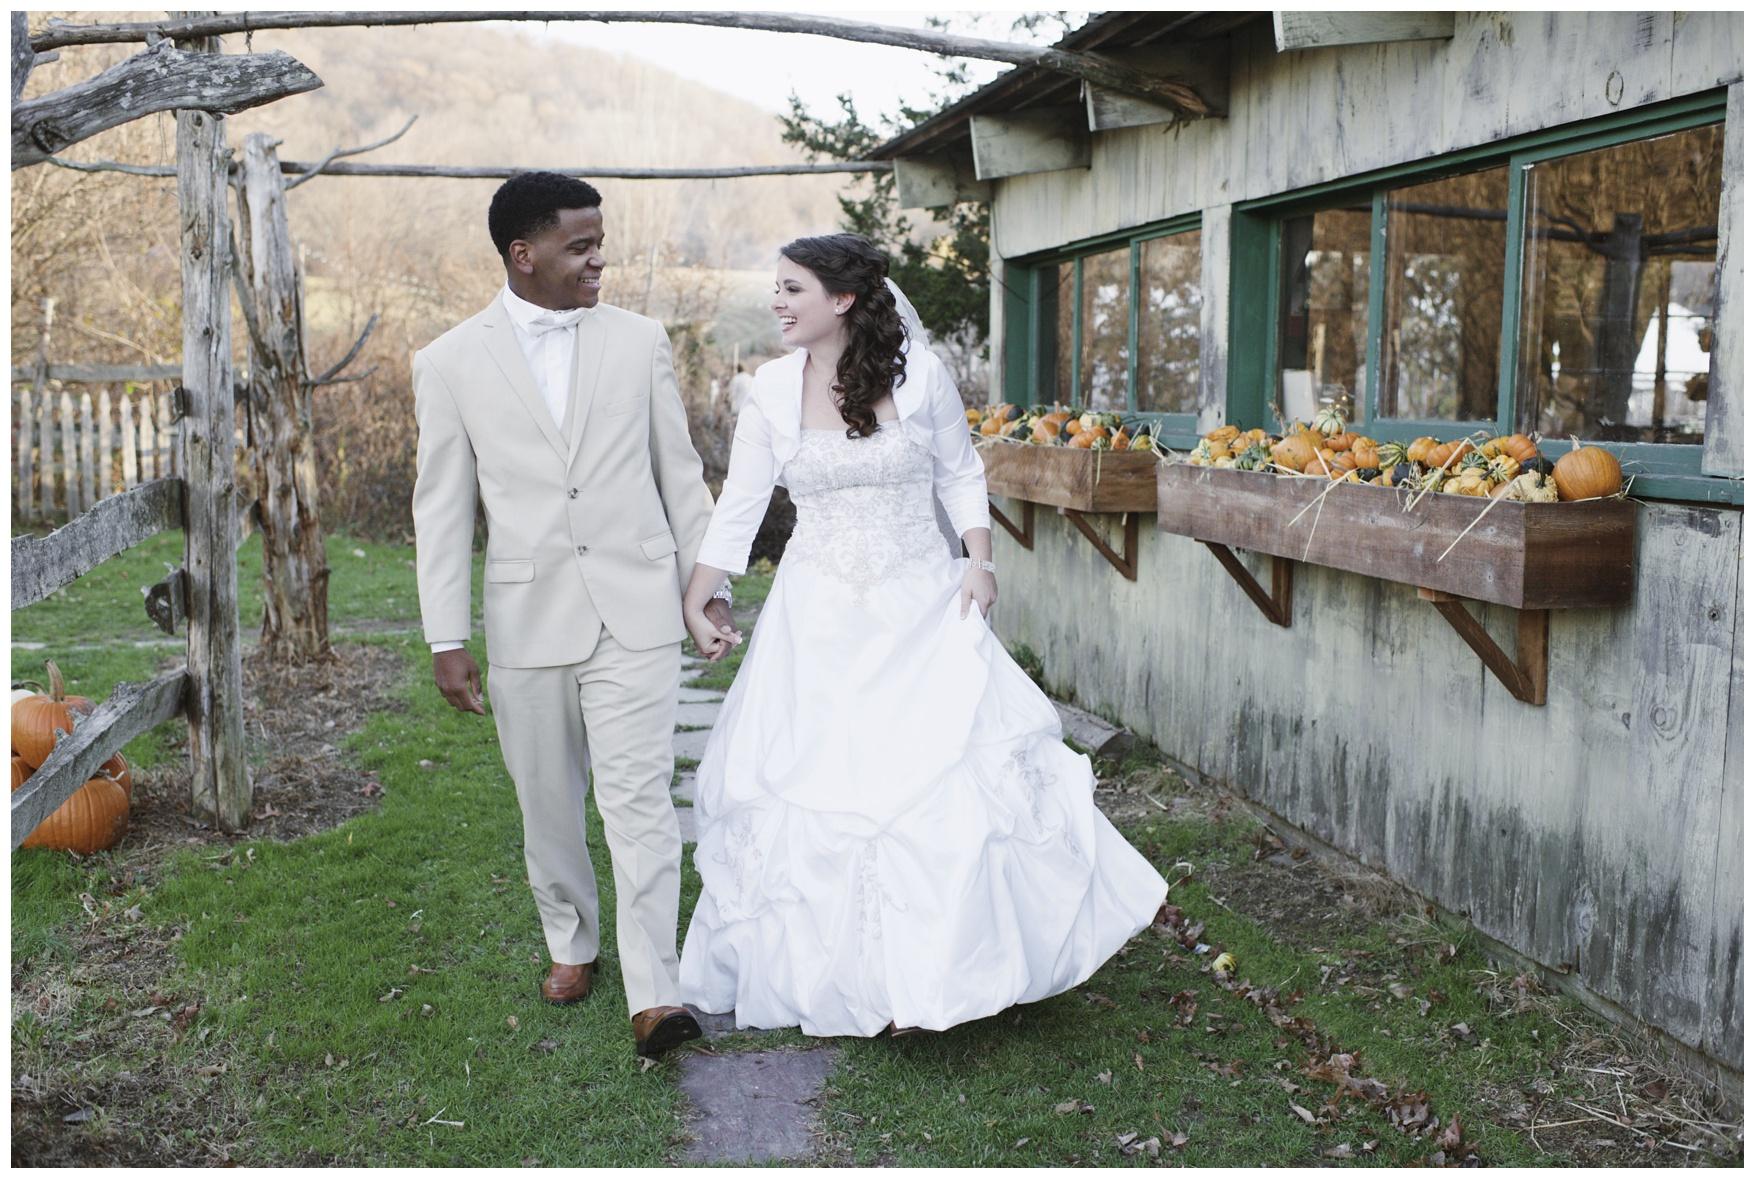 Elengant Wedding_0242.jpg